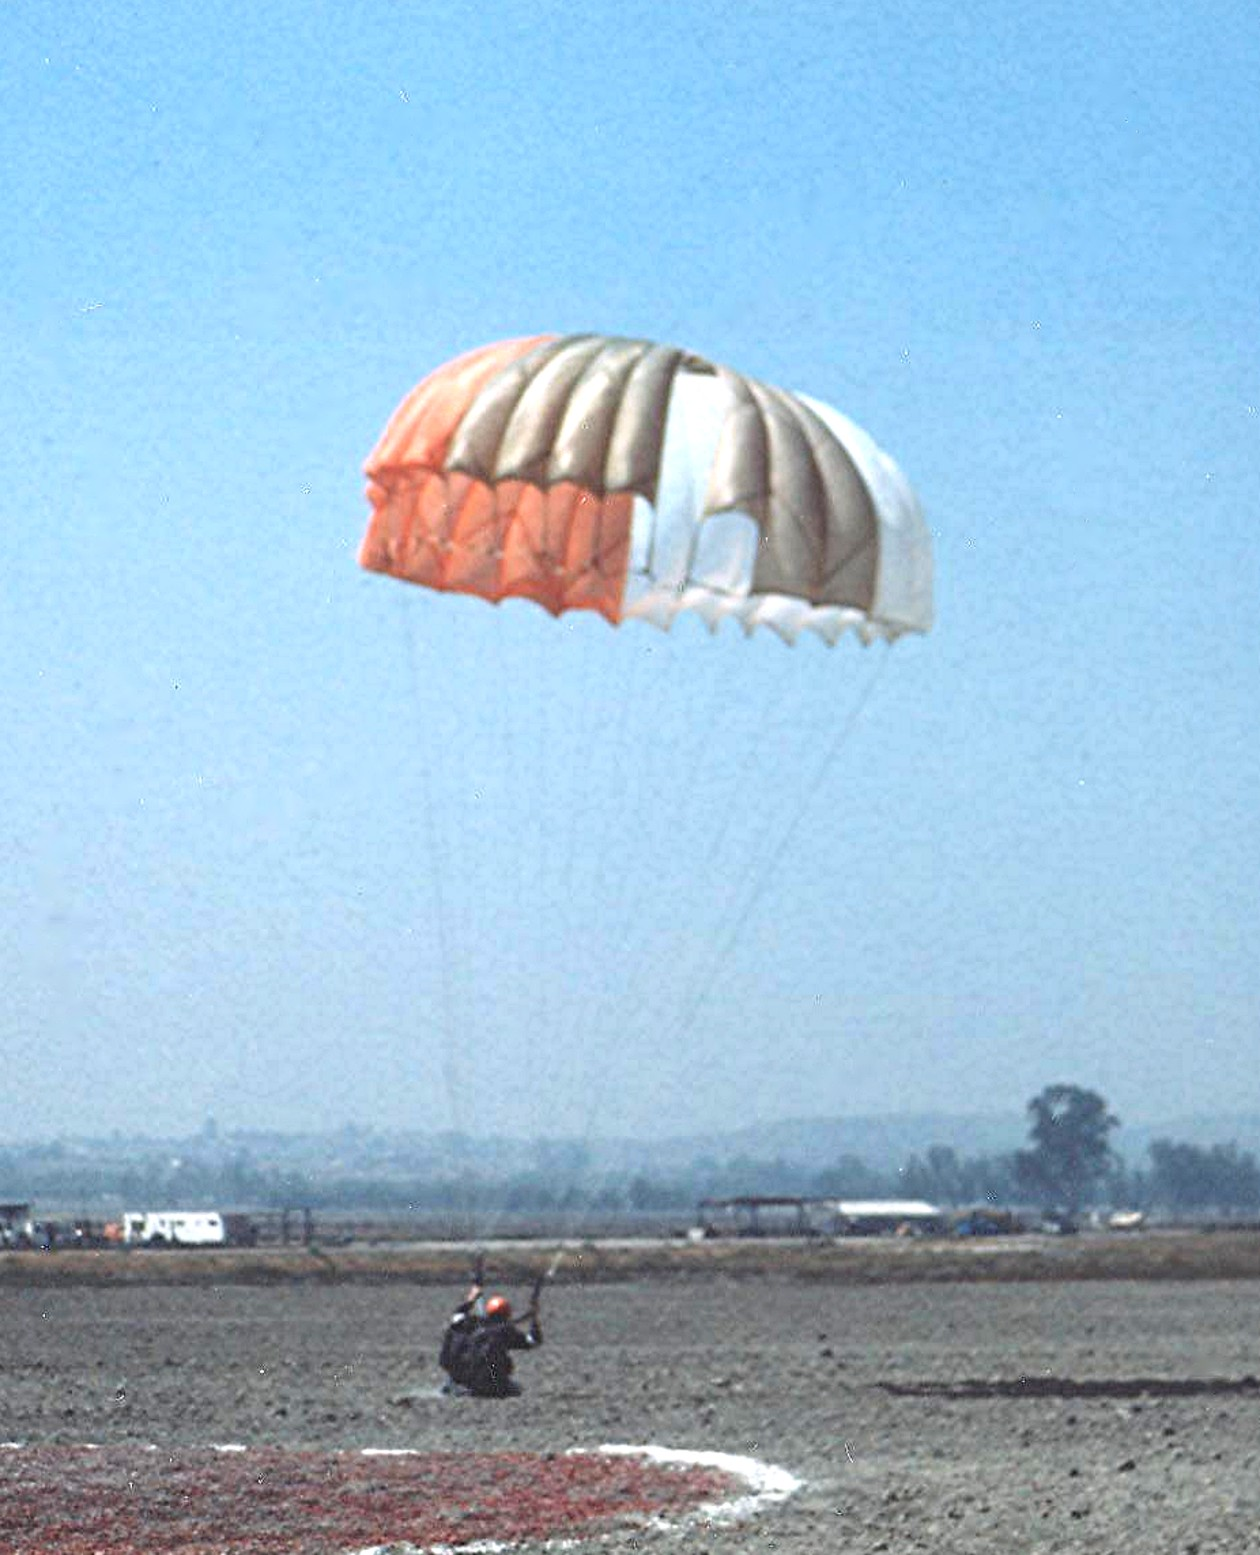 Landing a 7-TU